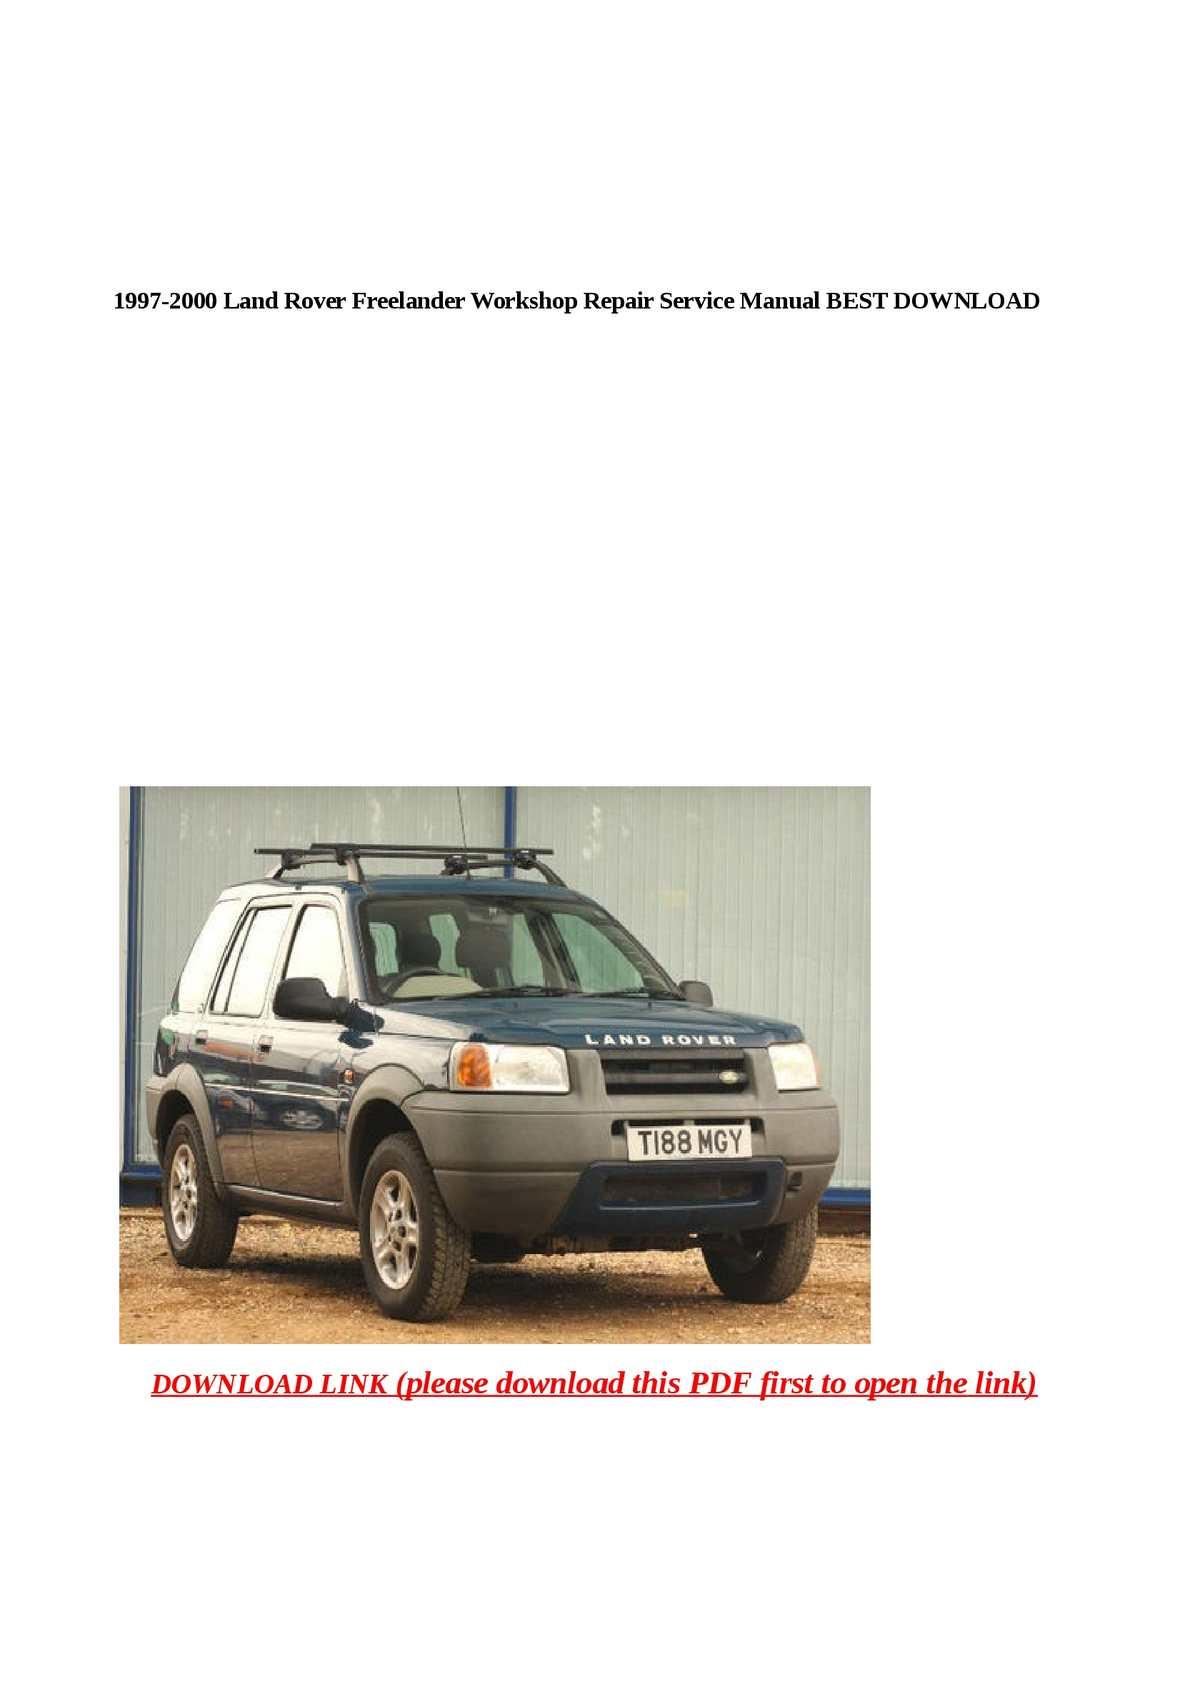 hight resolution of calam o 1997 2000 land rover freelander workshop repair service manual best download